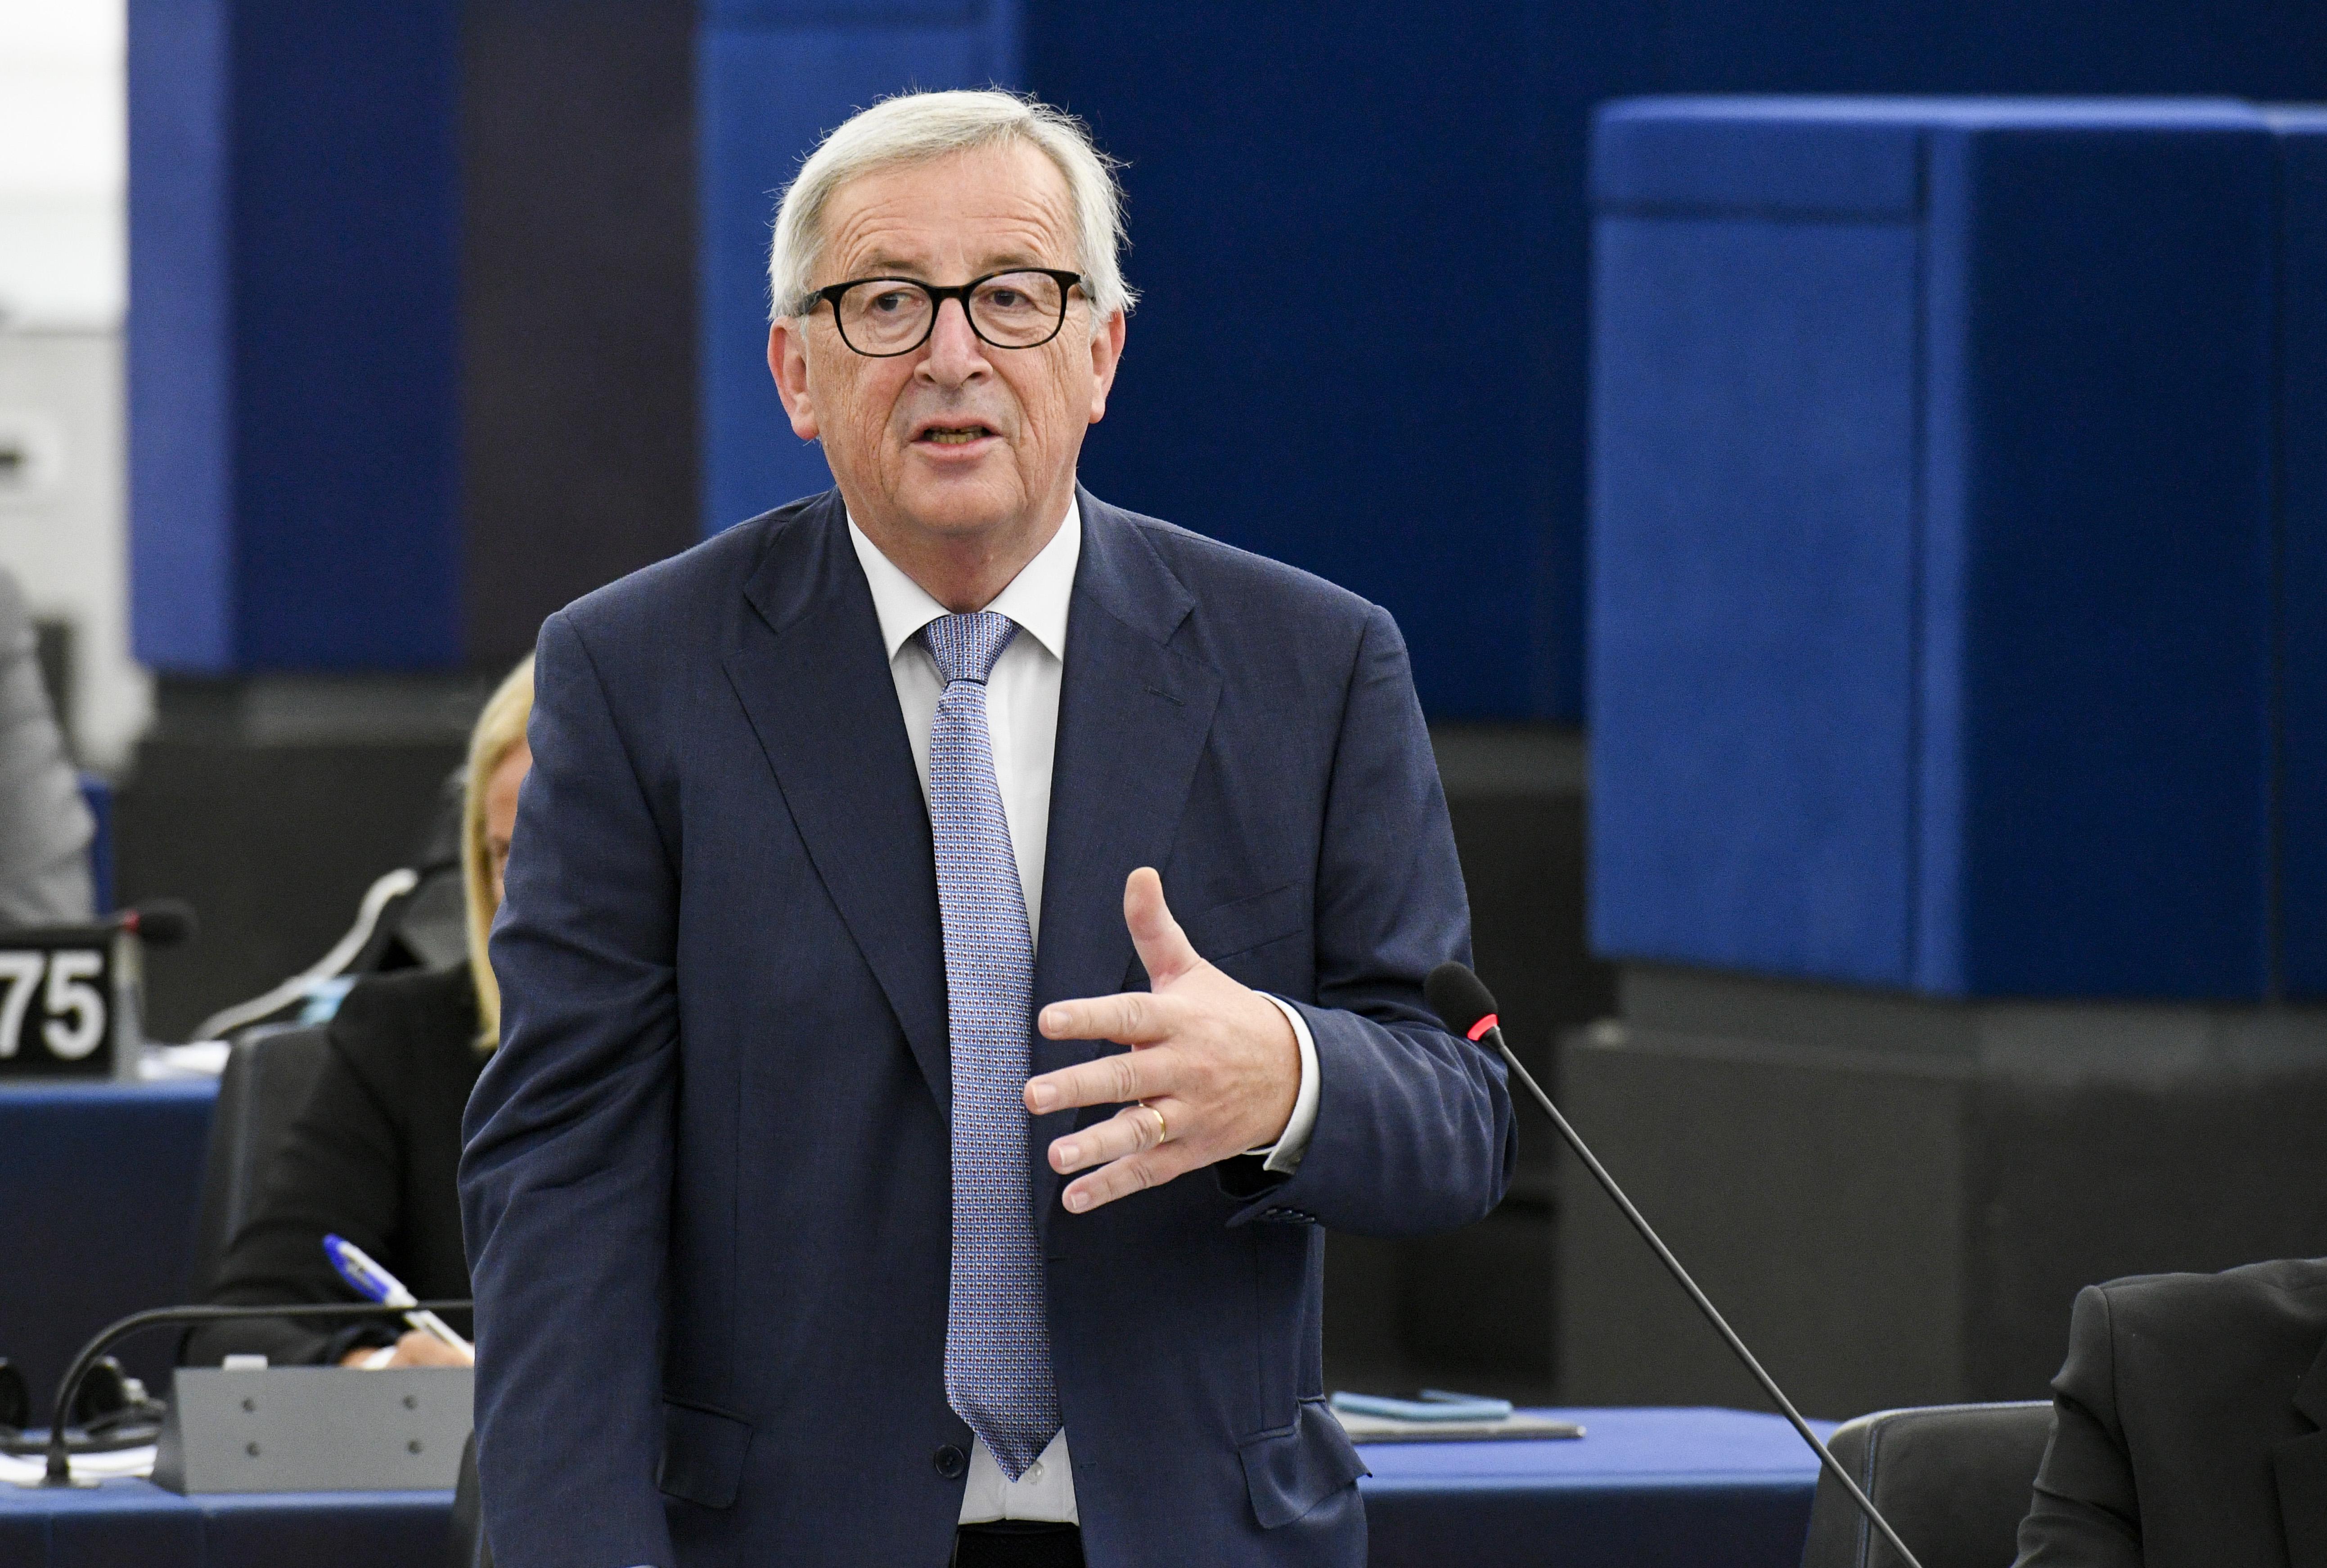 European Commission hearings #EPhearings2014